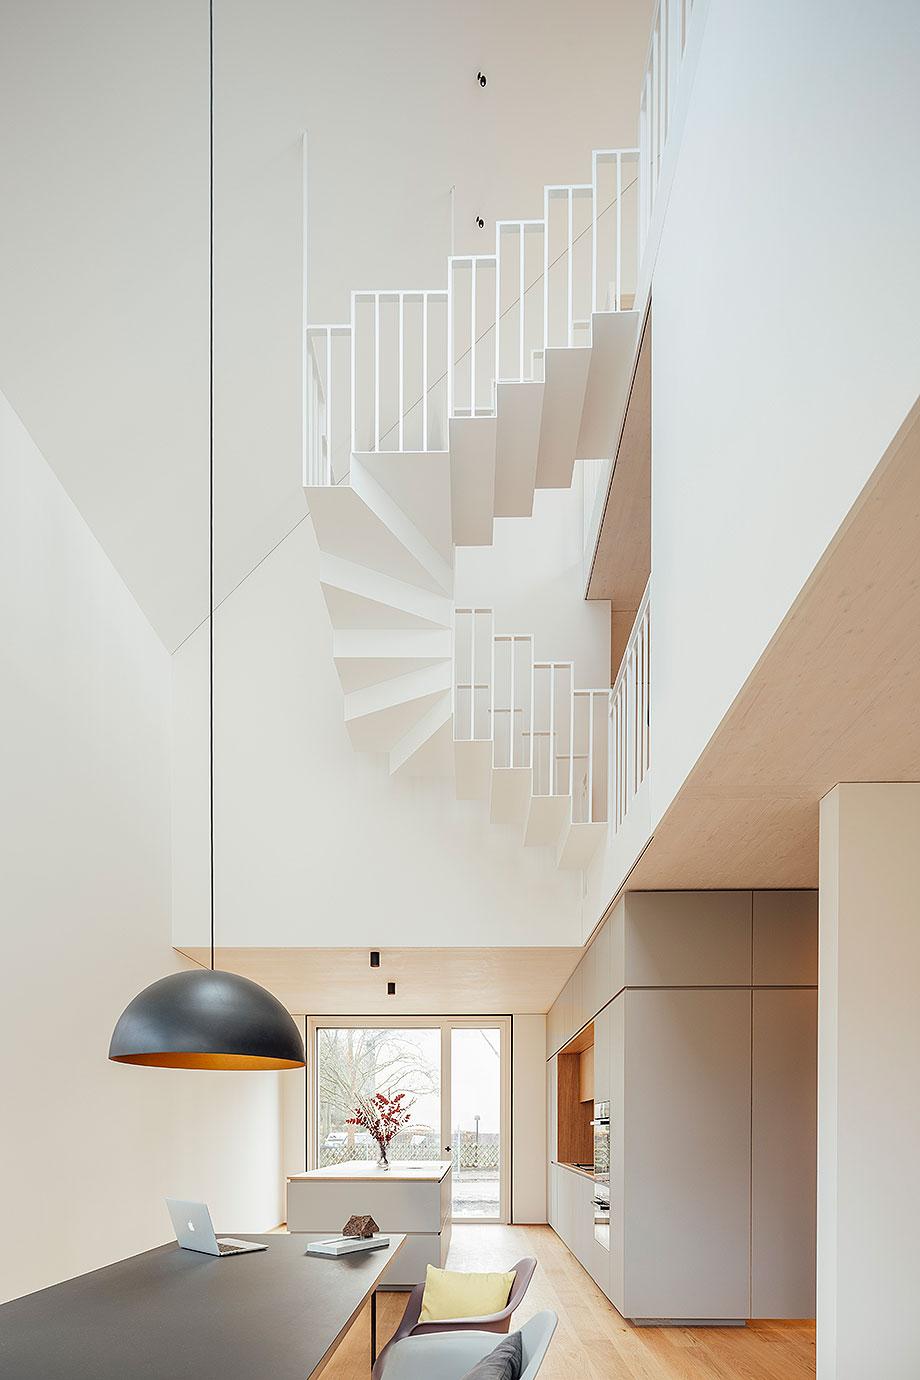 la casa de la pergola de rundzwei architekten (10) - foto gui rebelo